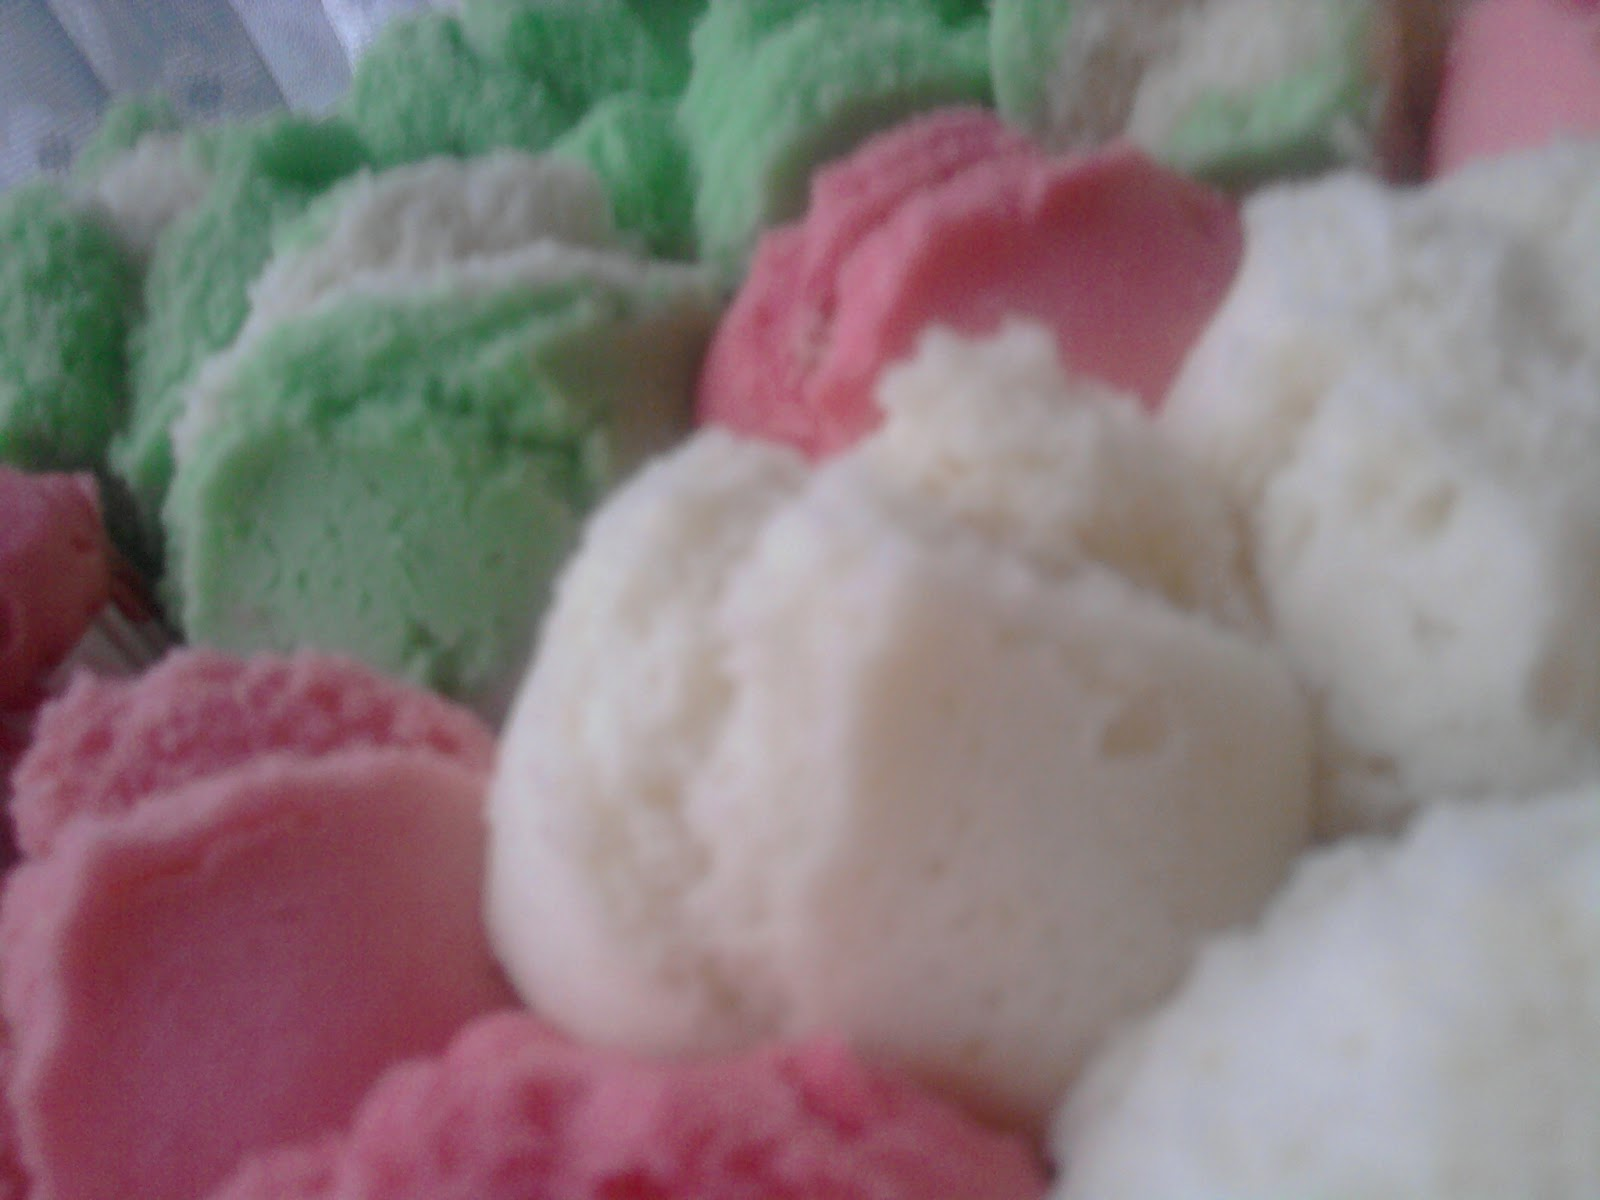 jenis kue resep dan cara membuat kue basah kukus susu